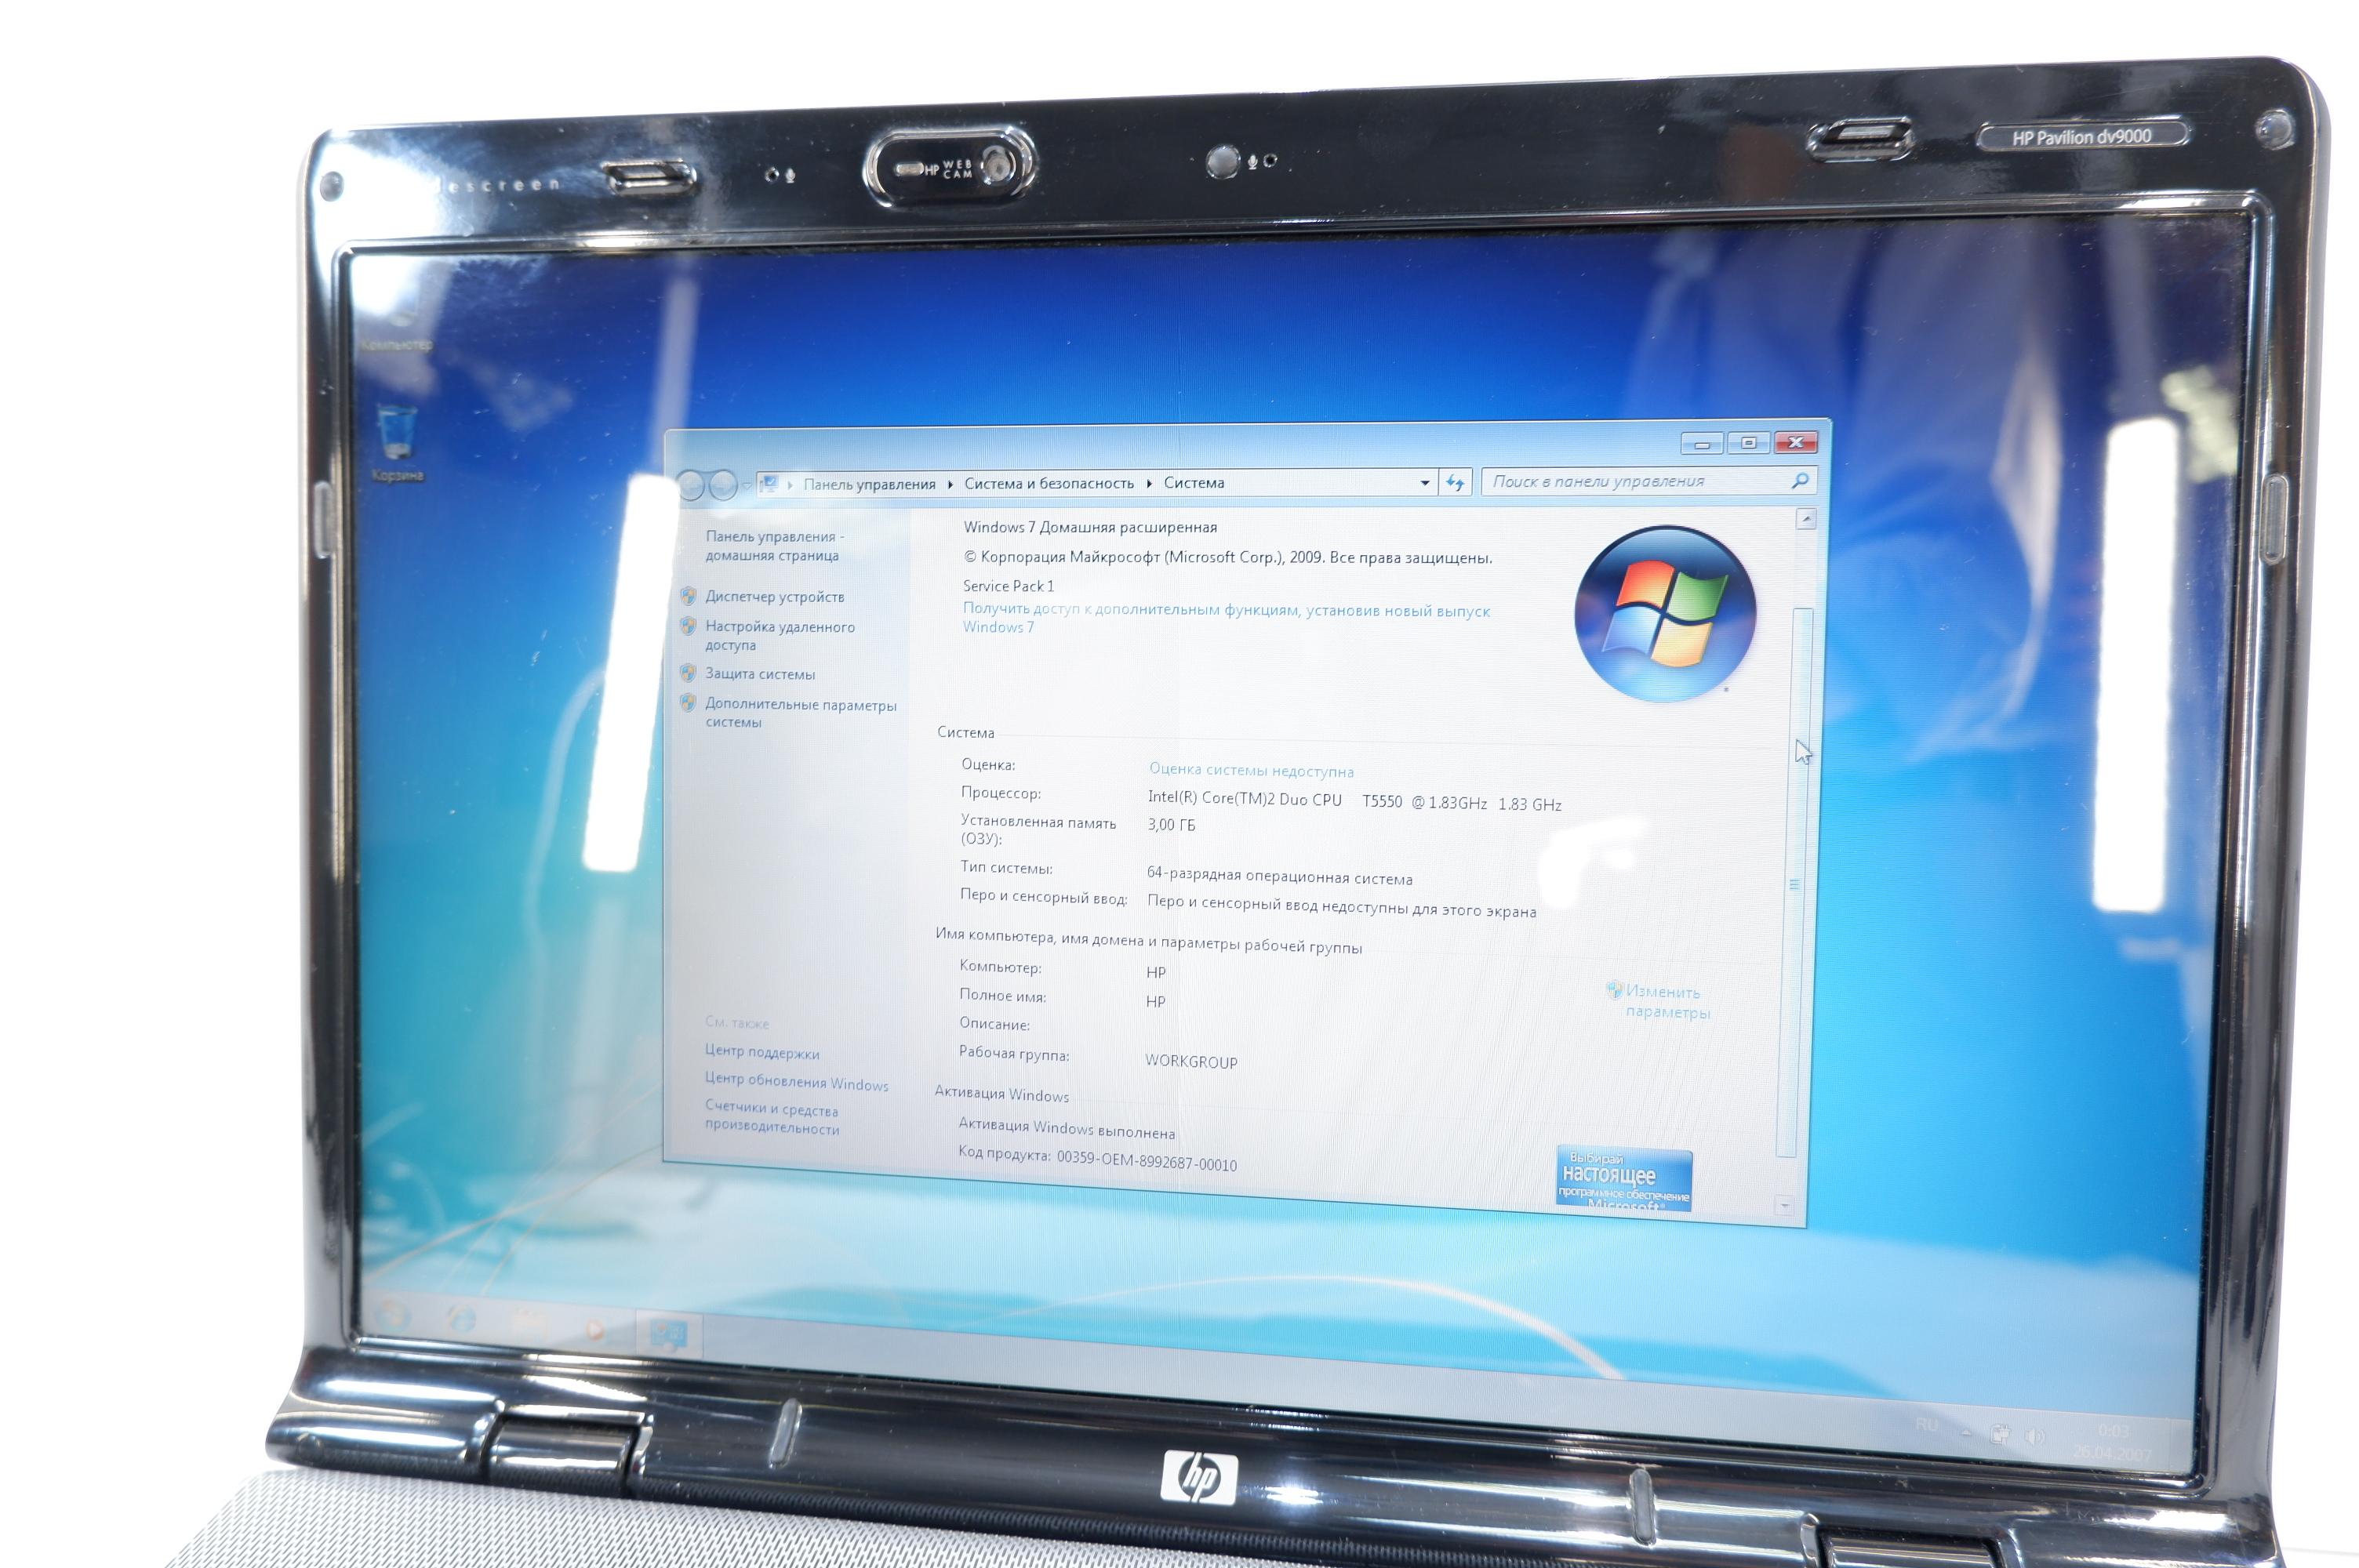 Wireless Driver for HP Pavilion dv9000 Windows 7